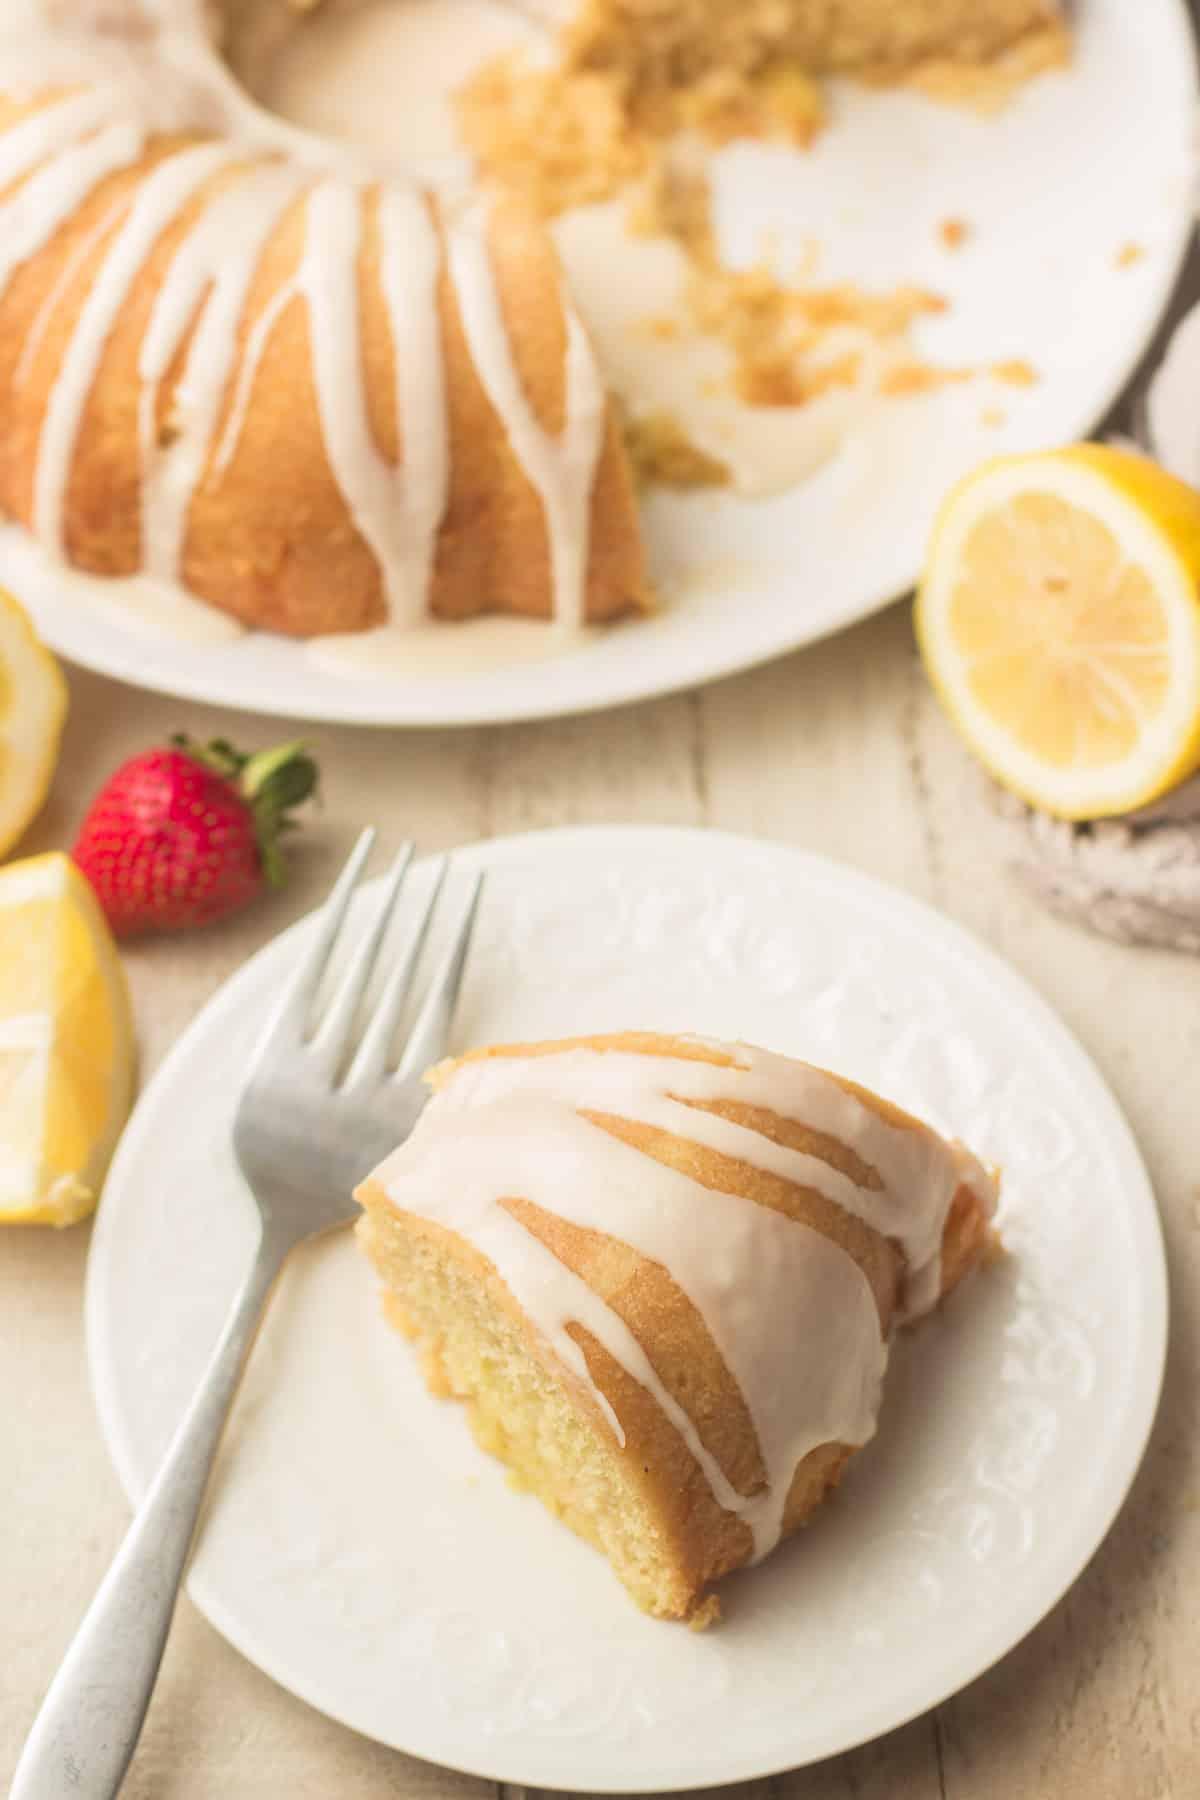 Table Set with Vegan Lemon Cake on a Dish, Lemon Slices, Strawberries, and a Slice of Vegan Lemon Cake on a Plate